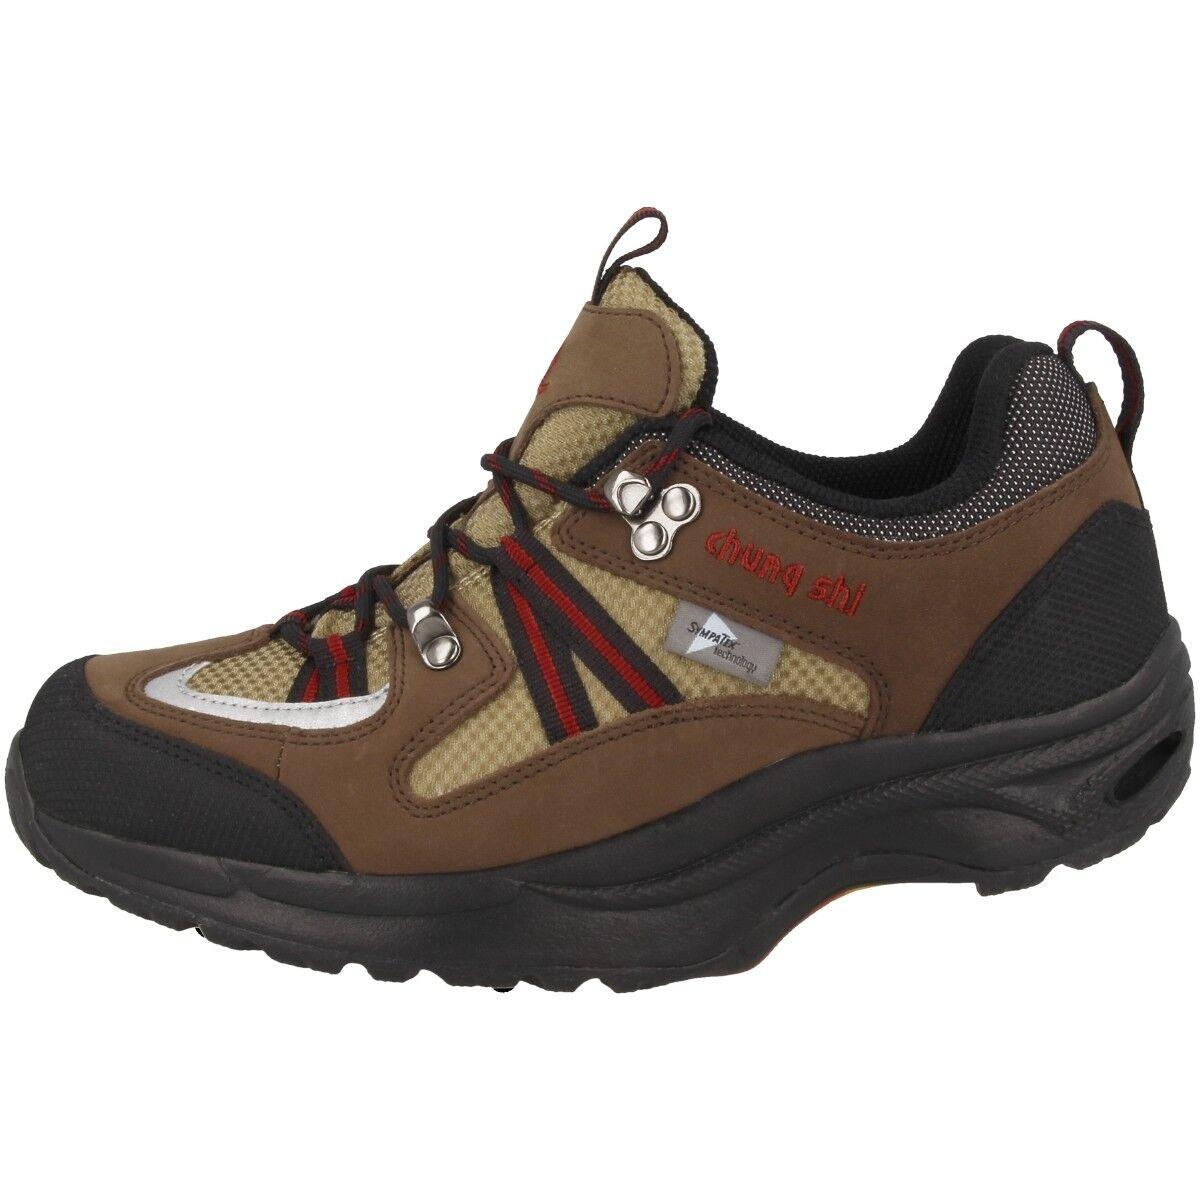 Chung Shi Balance Step Step Step Todo Tipo de Clima Mujeres Senderismo Zapatos 9100160  precios bajos todos los dias